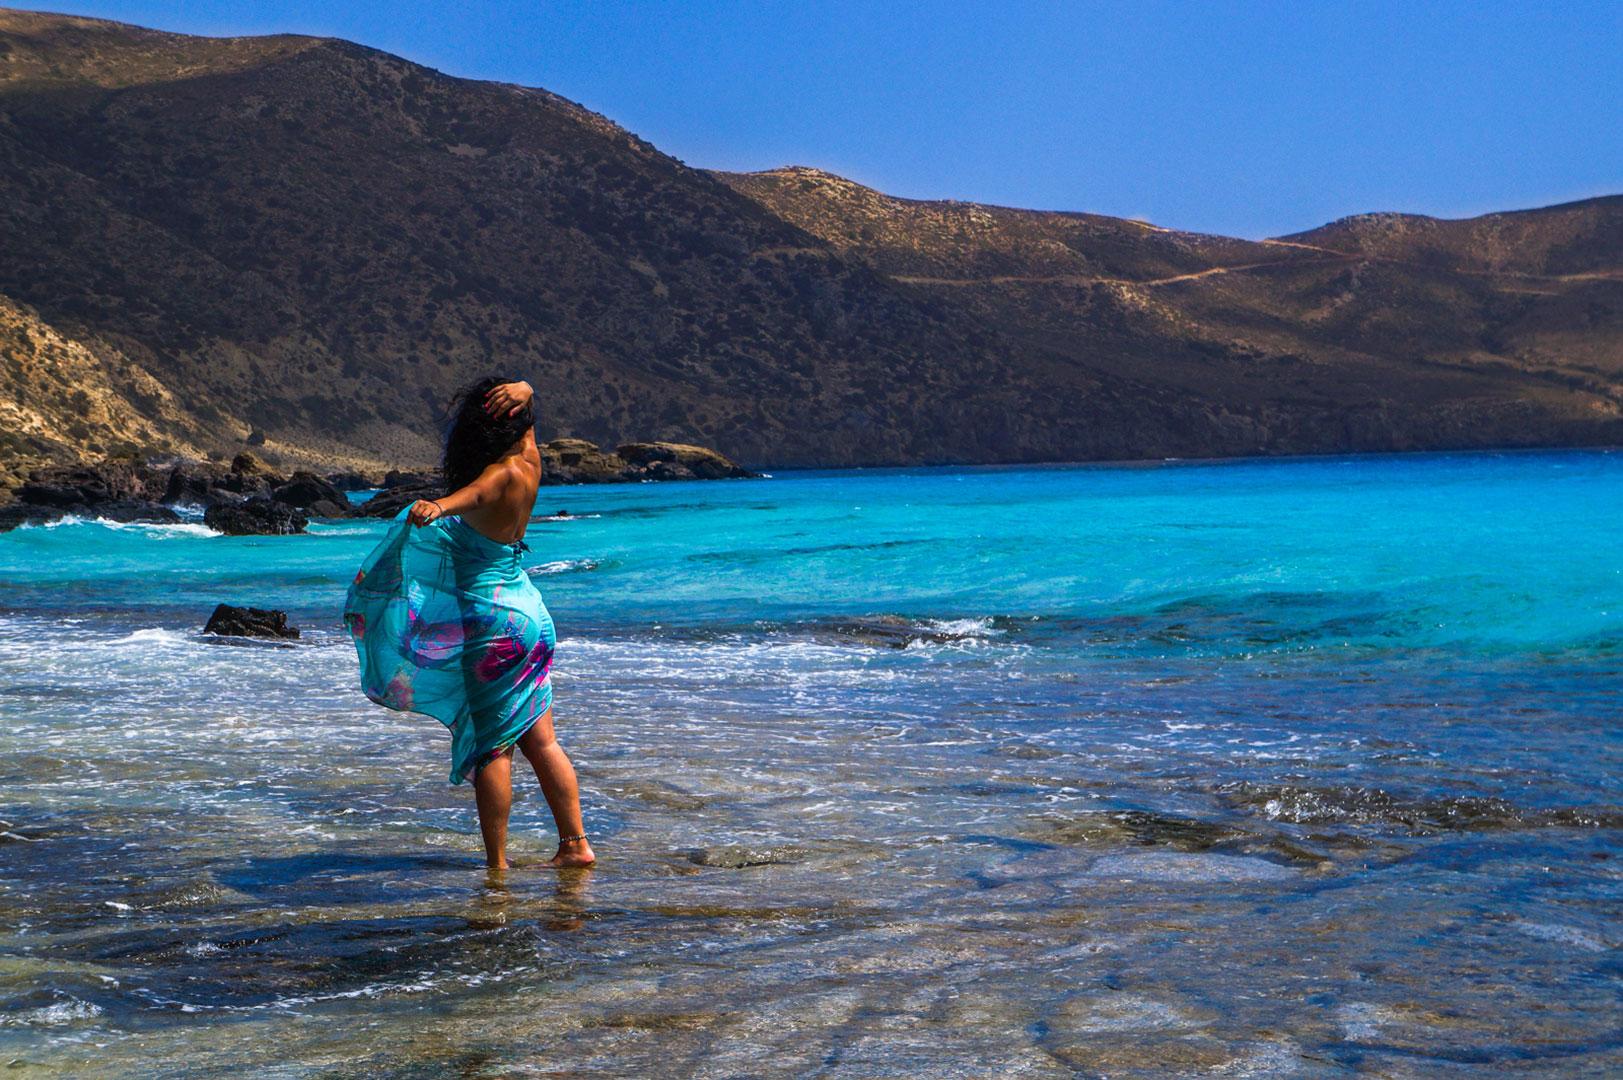 kedrodasos-chania-crete-greece-la-vie-en-blog-all-rights-reserved-2